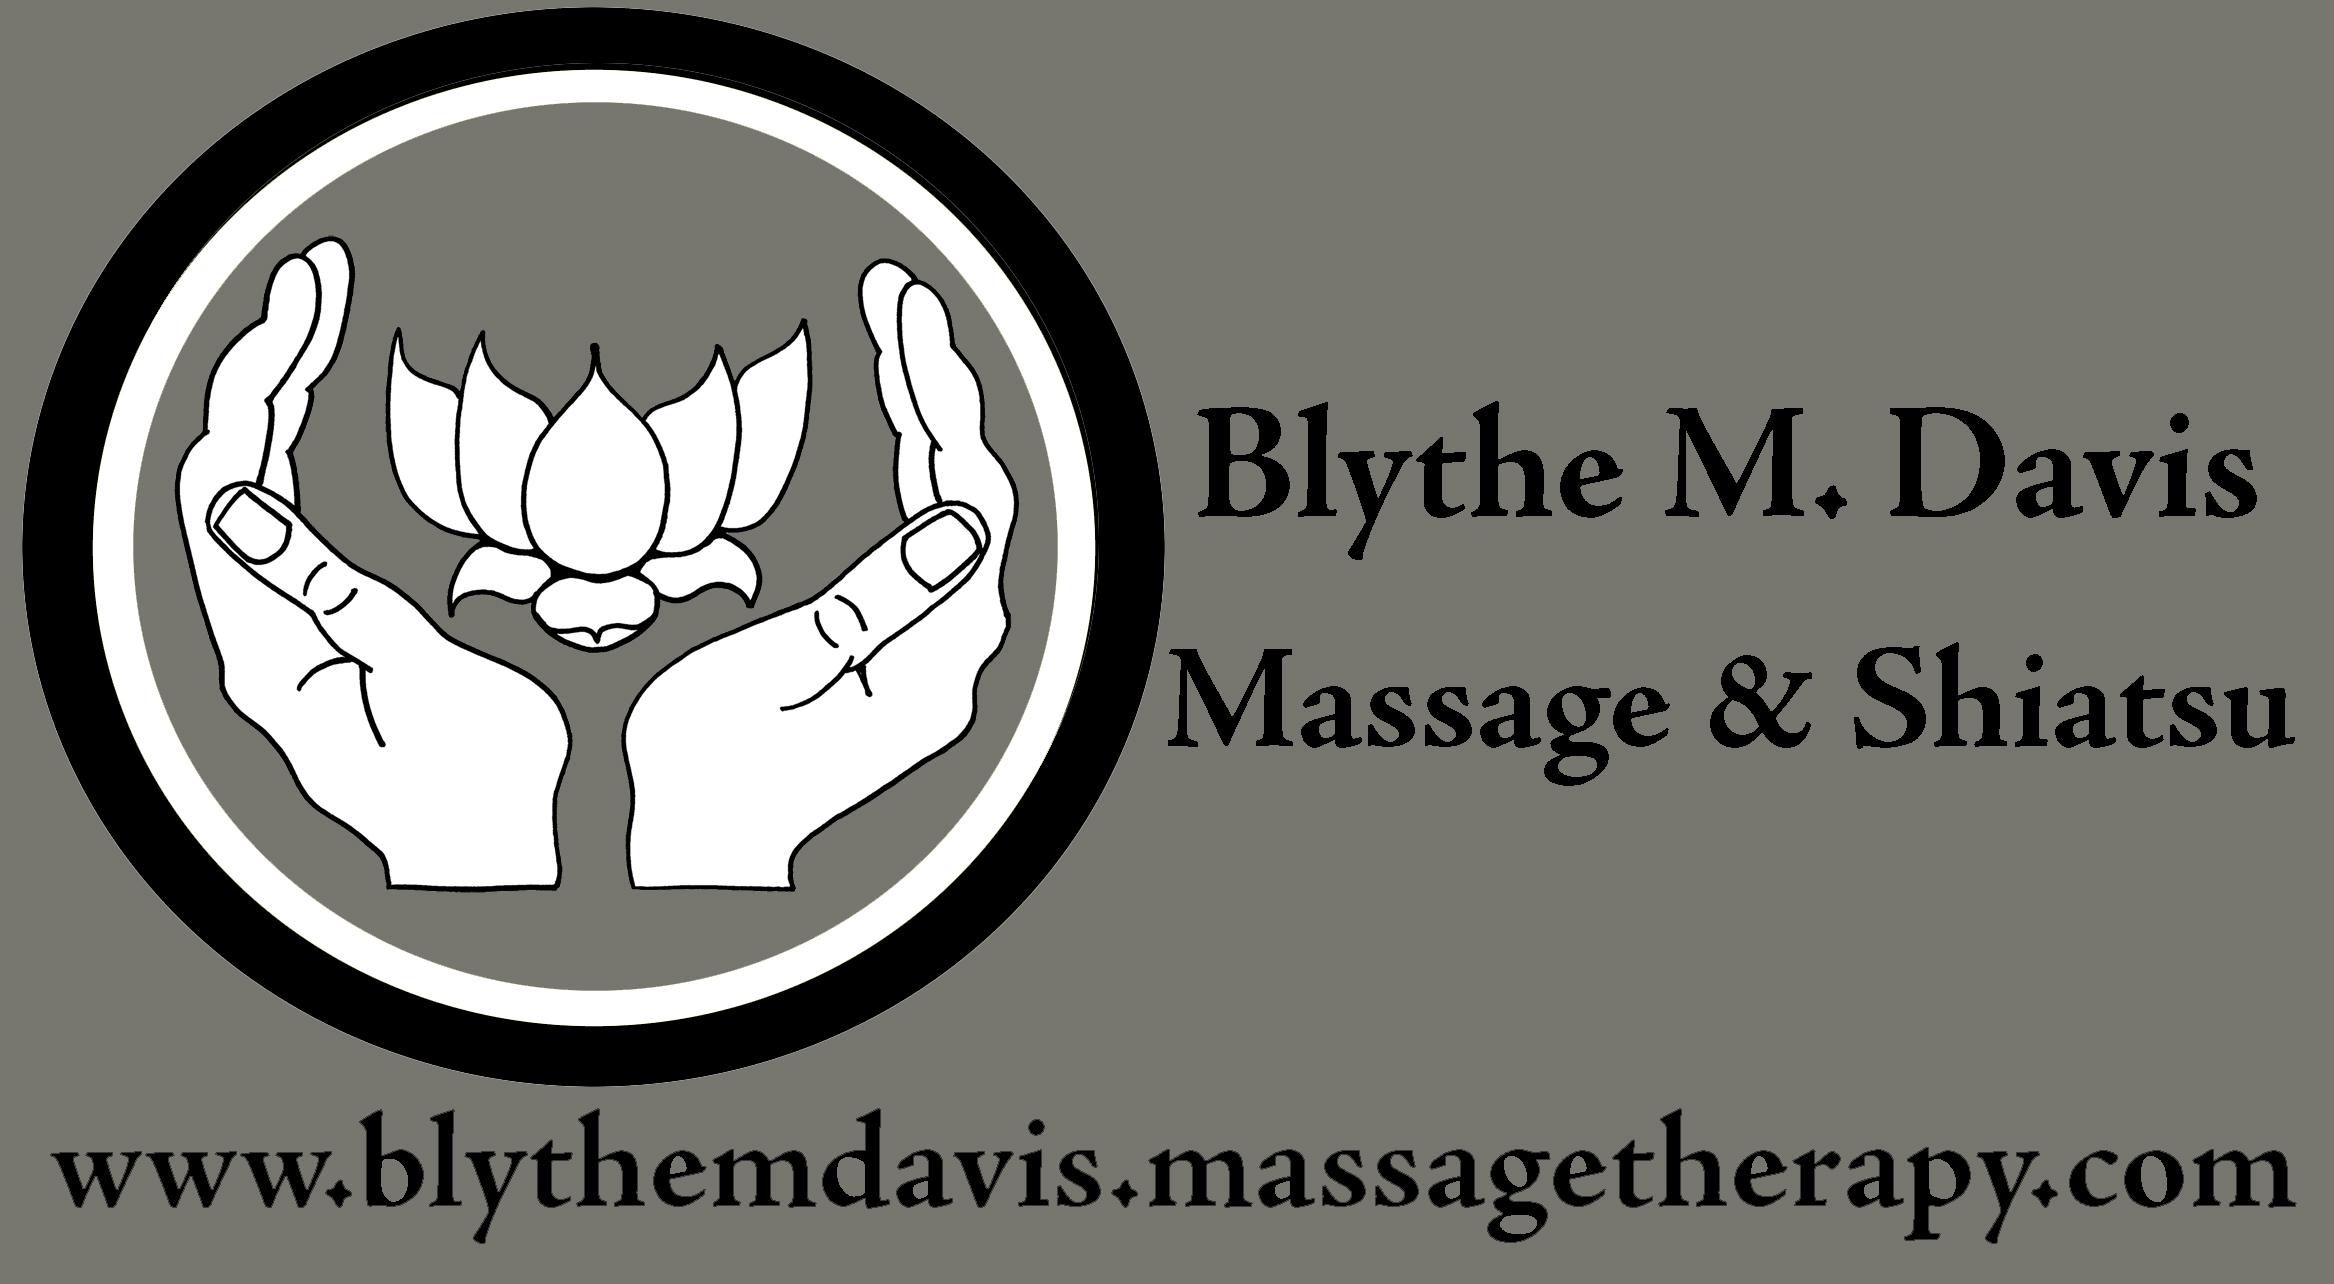 Blythe M. Davis Massage & Shiatsu www.blythemdavis.massagetherapy.com